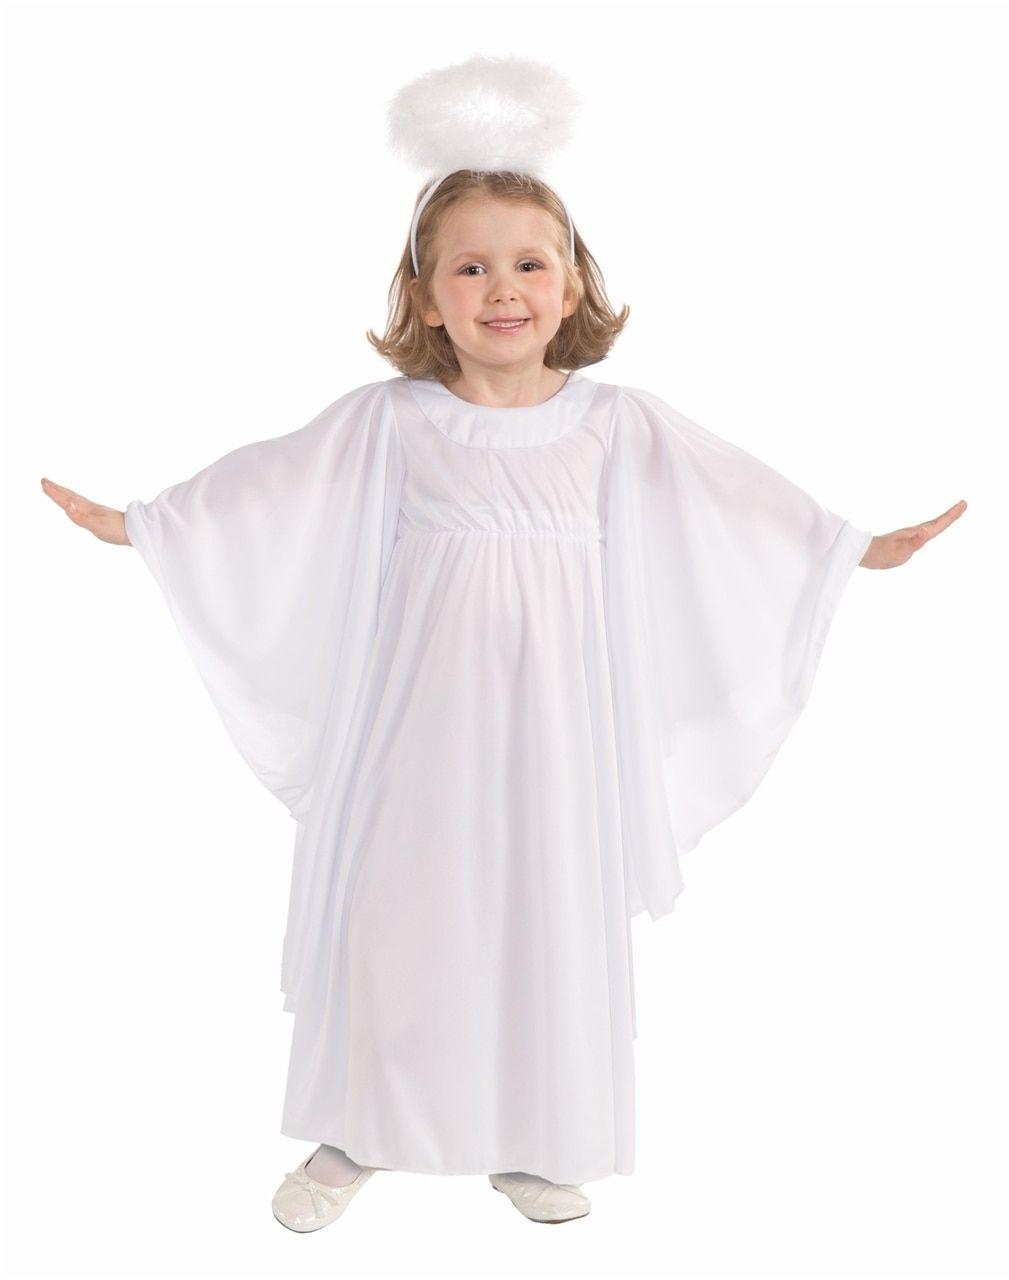 Toddler S Simple Angel Costume Angel Costume Diy Kids Angel Costume Girls Angel Costume